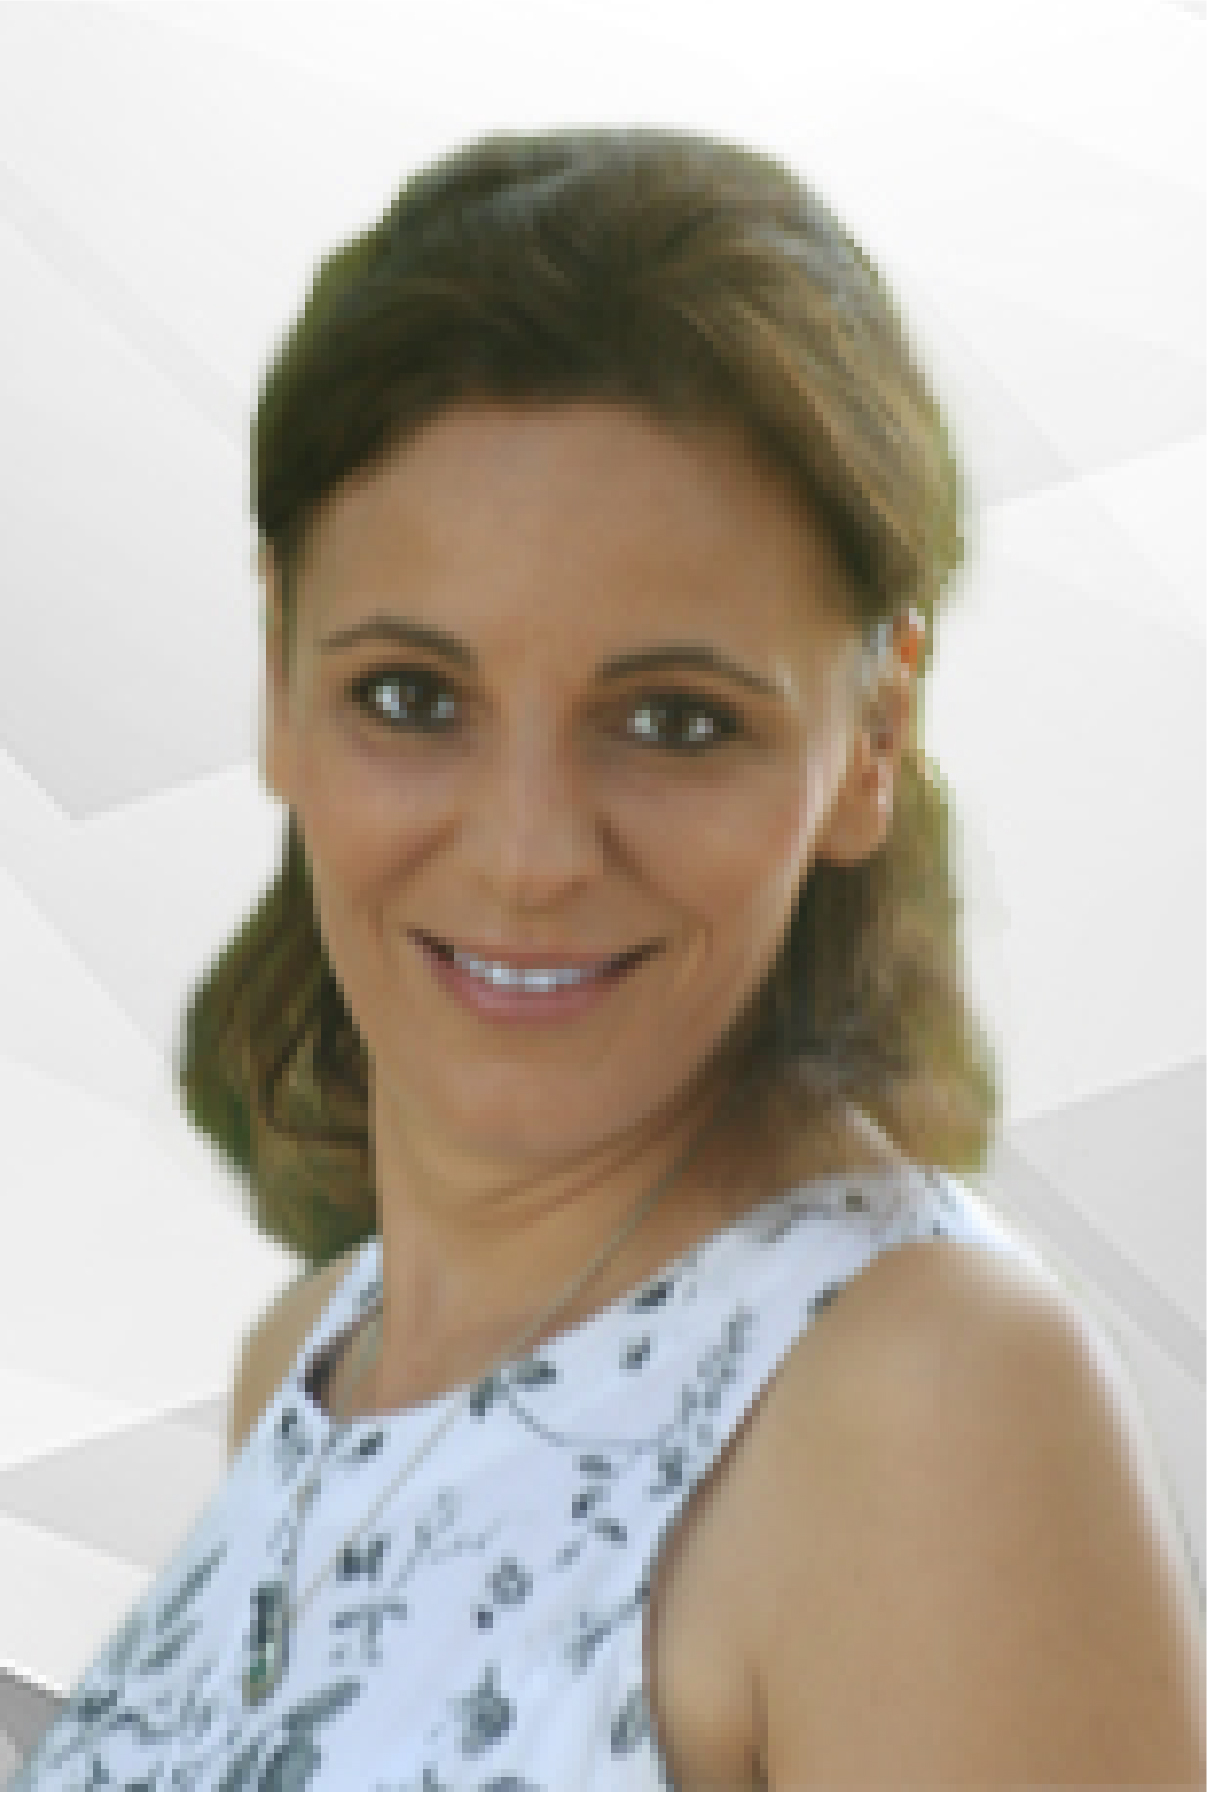 Szelei Annamária